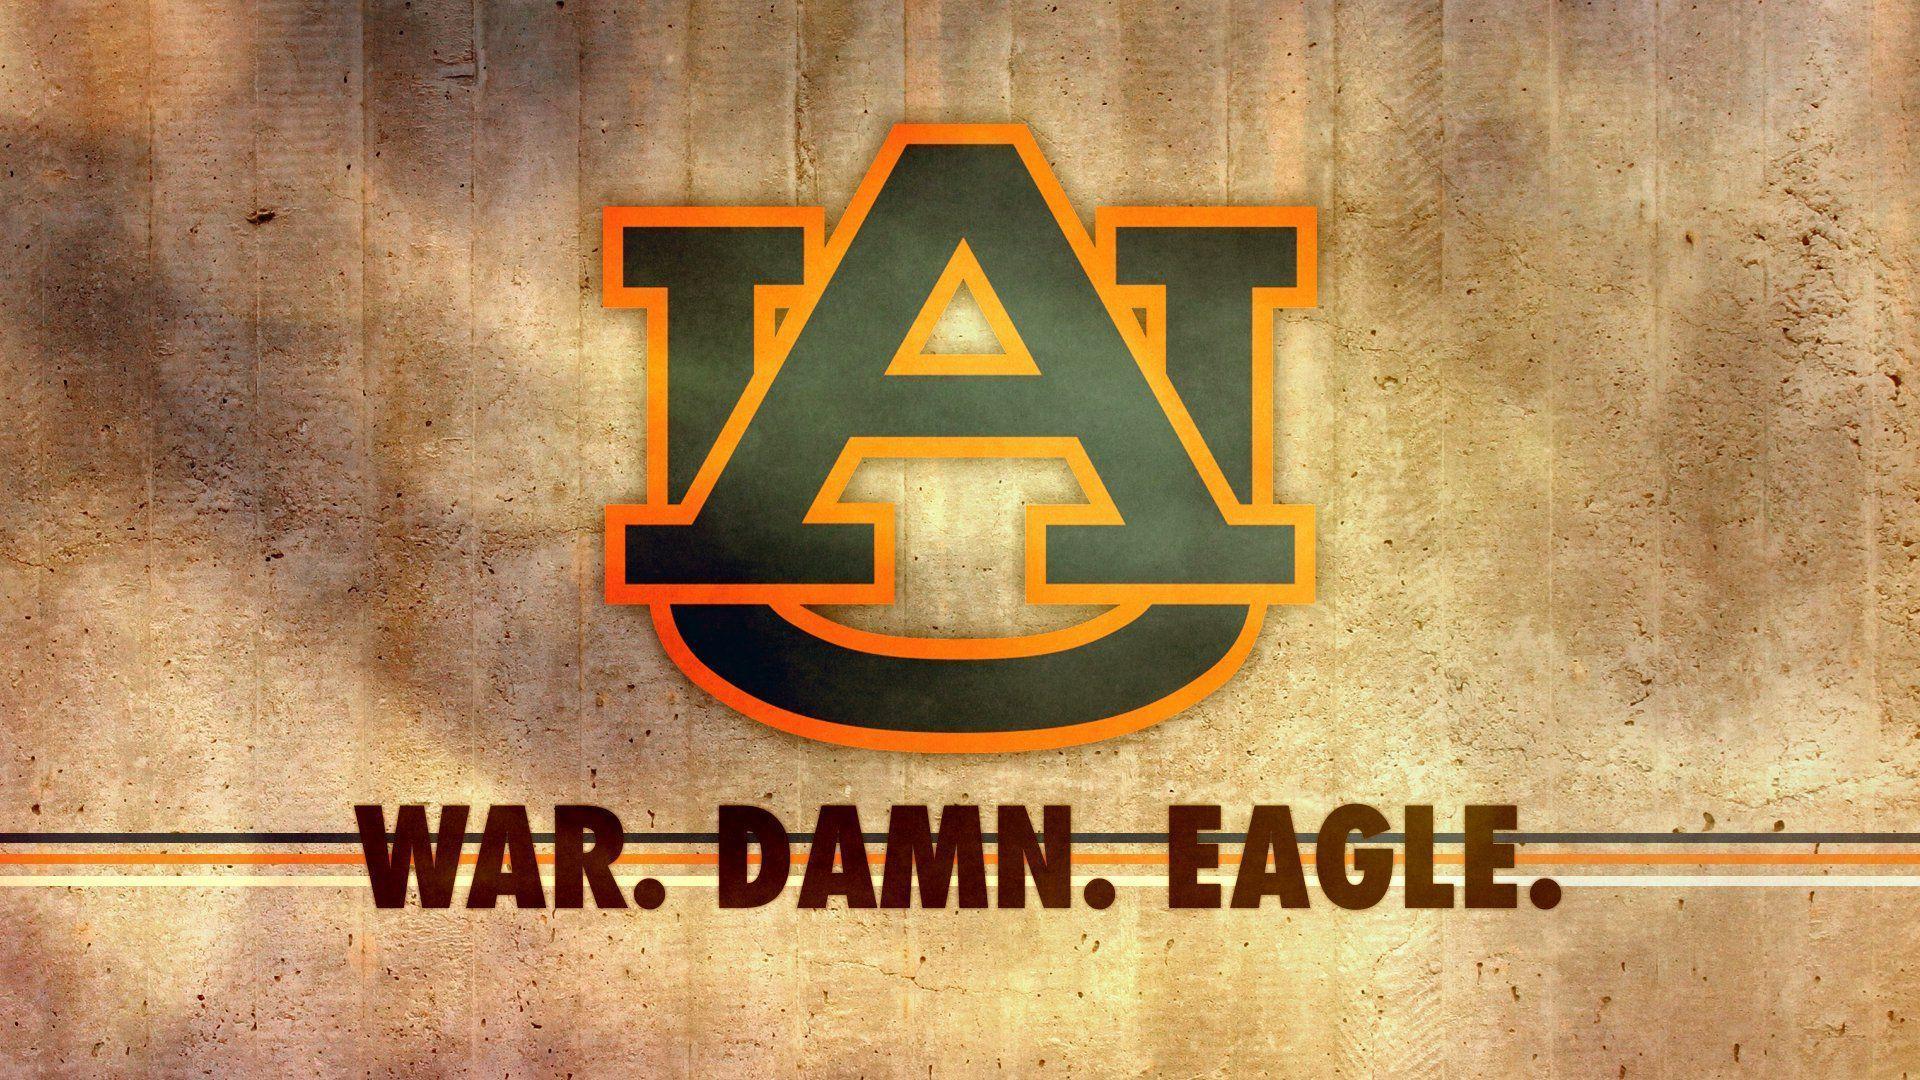 auburn tigers wallpapers wallpaper cave rh wallpapercave com Auburn Football Auburn Screensaver